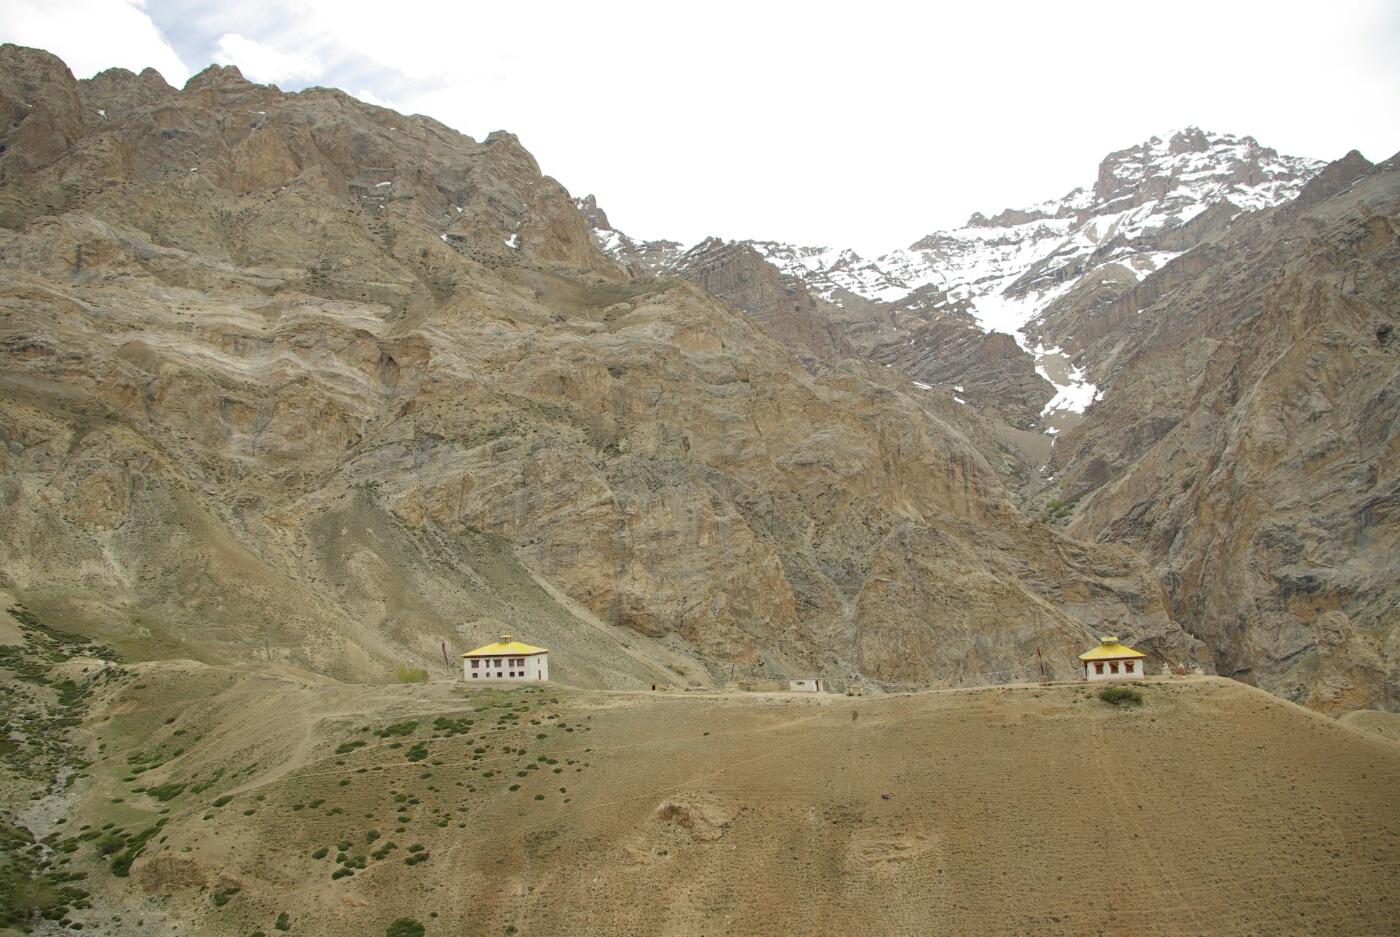 Phokar, Padmasambhava: Blick auf die andere Talseite